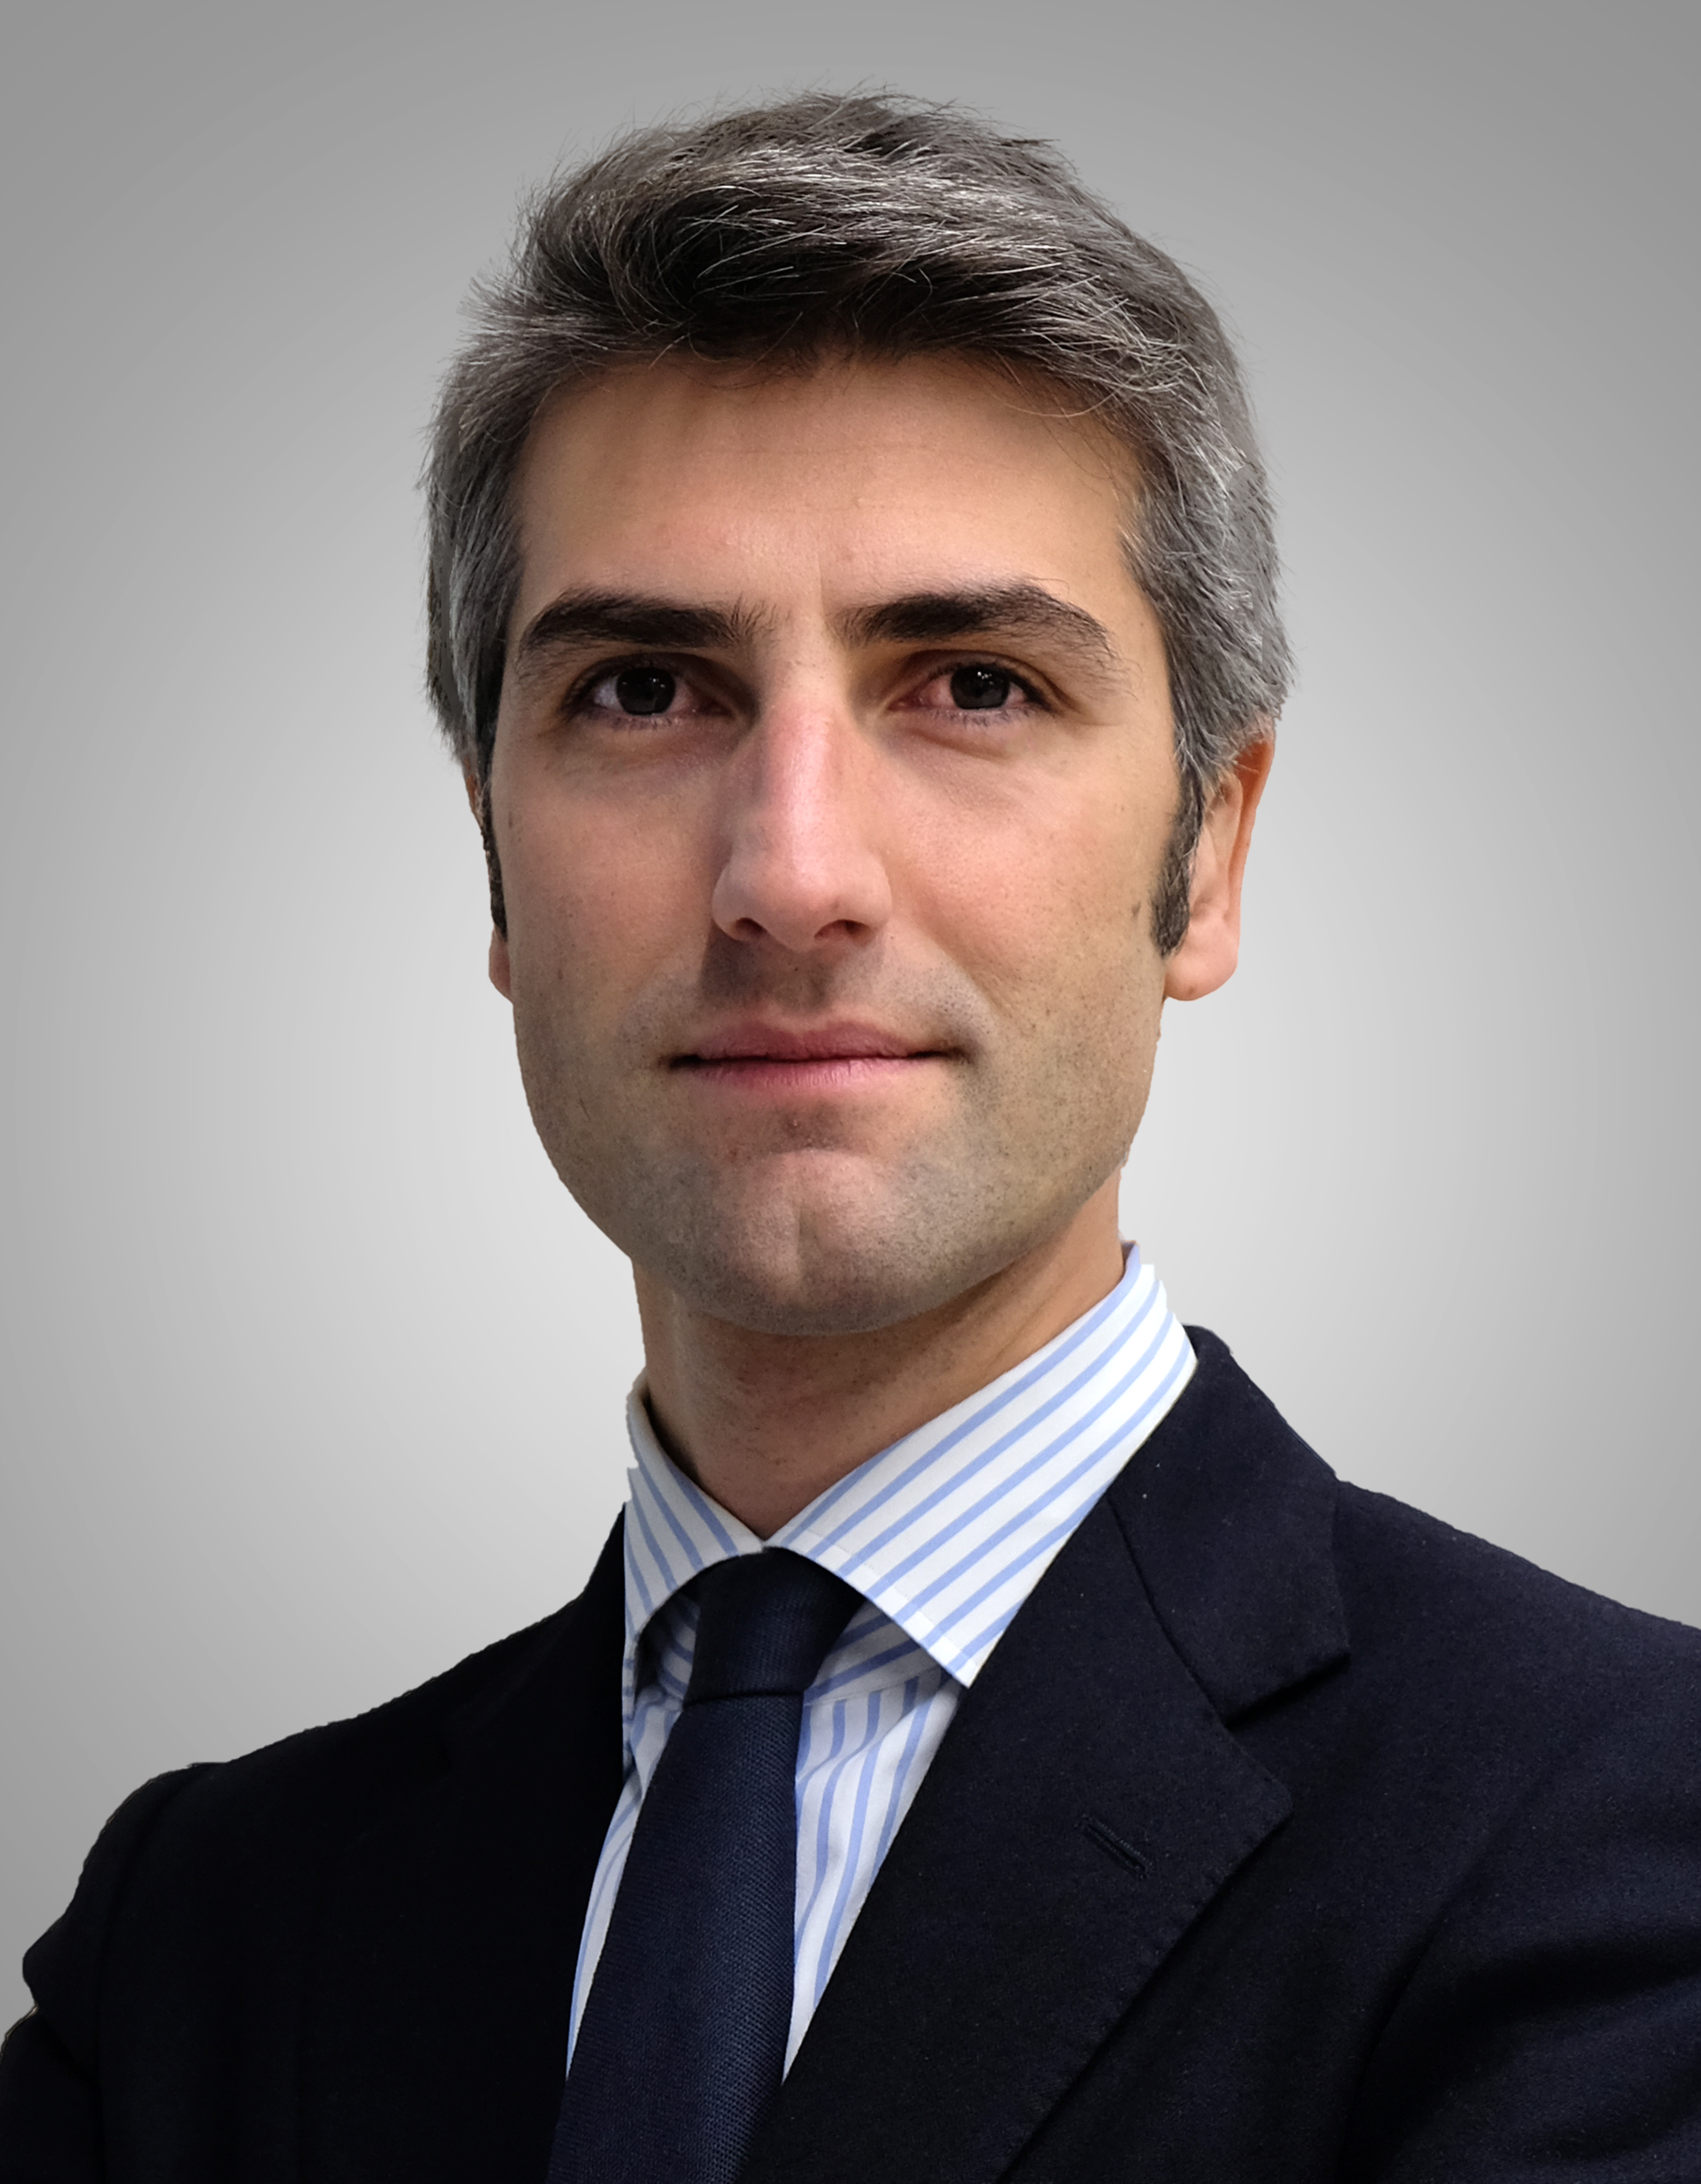 Andrea Mancini